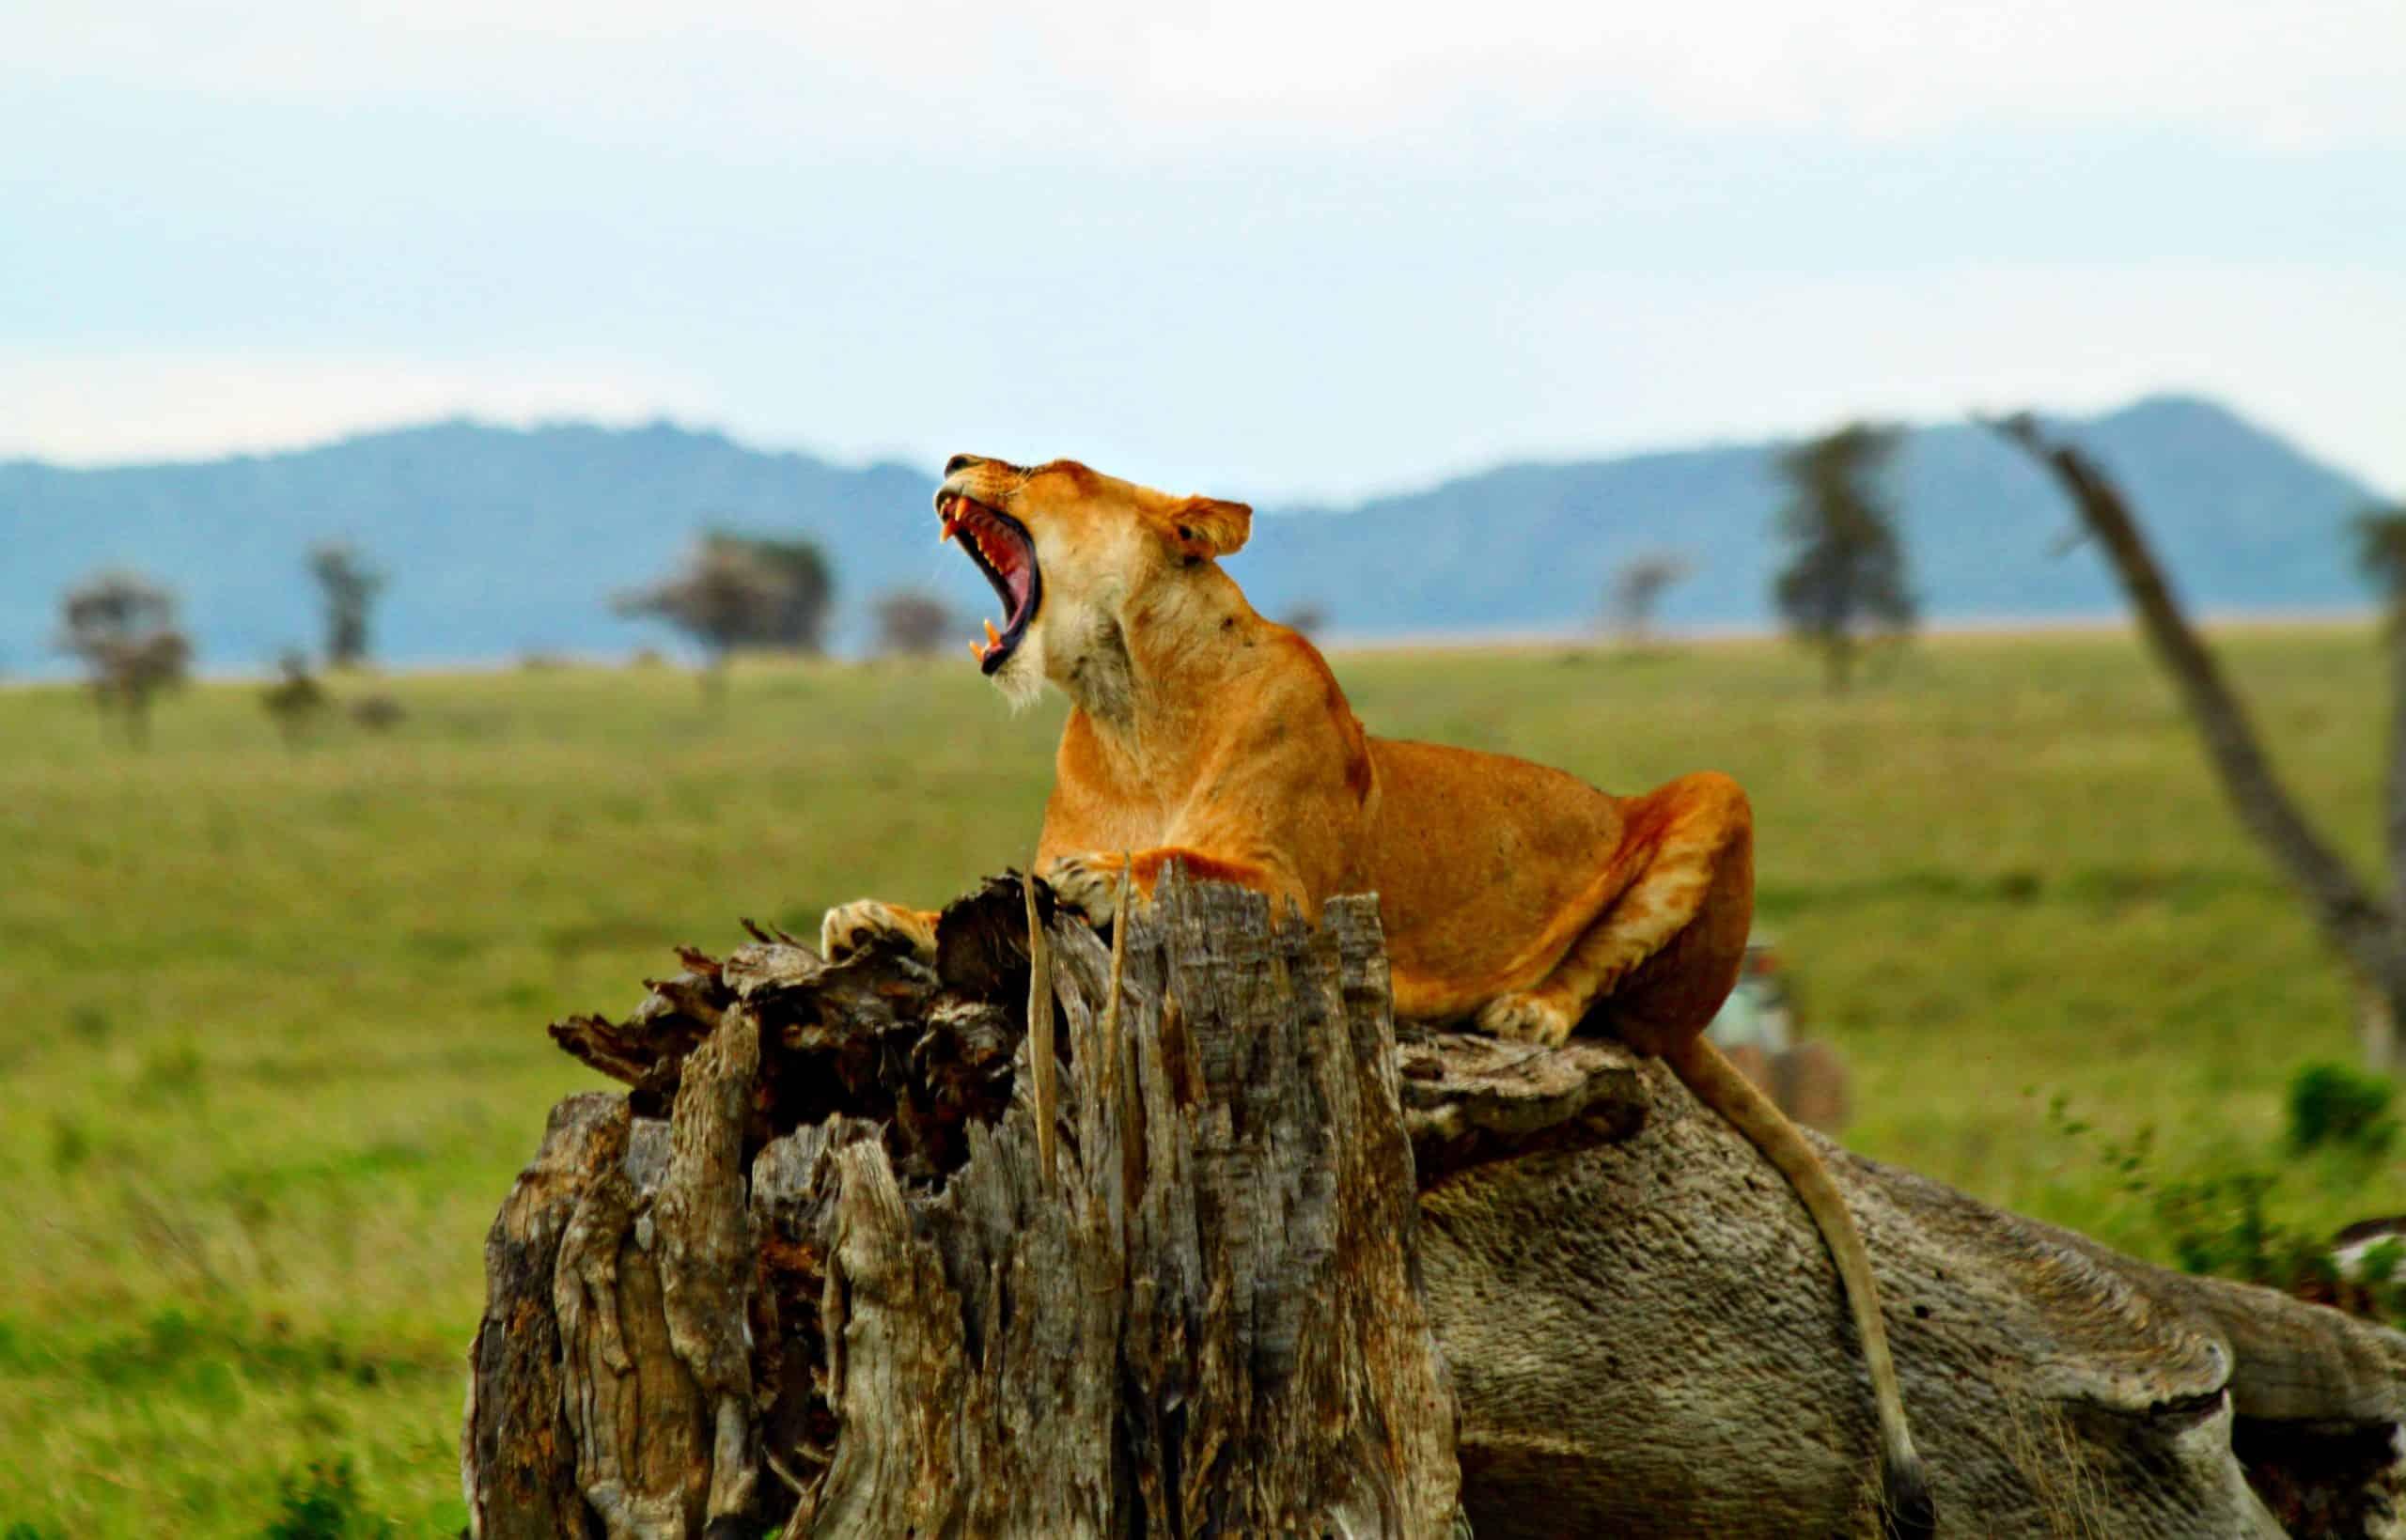 Africanaturaltours Tanzania Safari Arusha (26) Copy